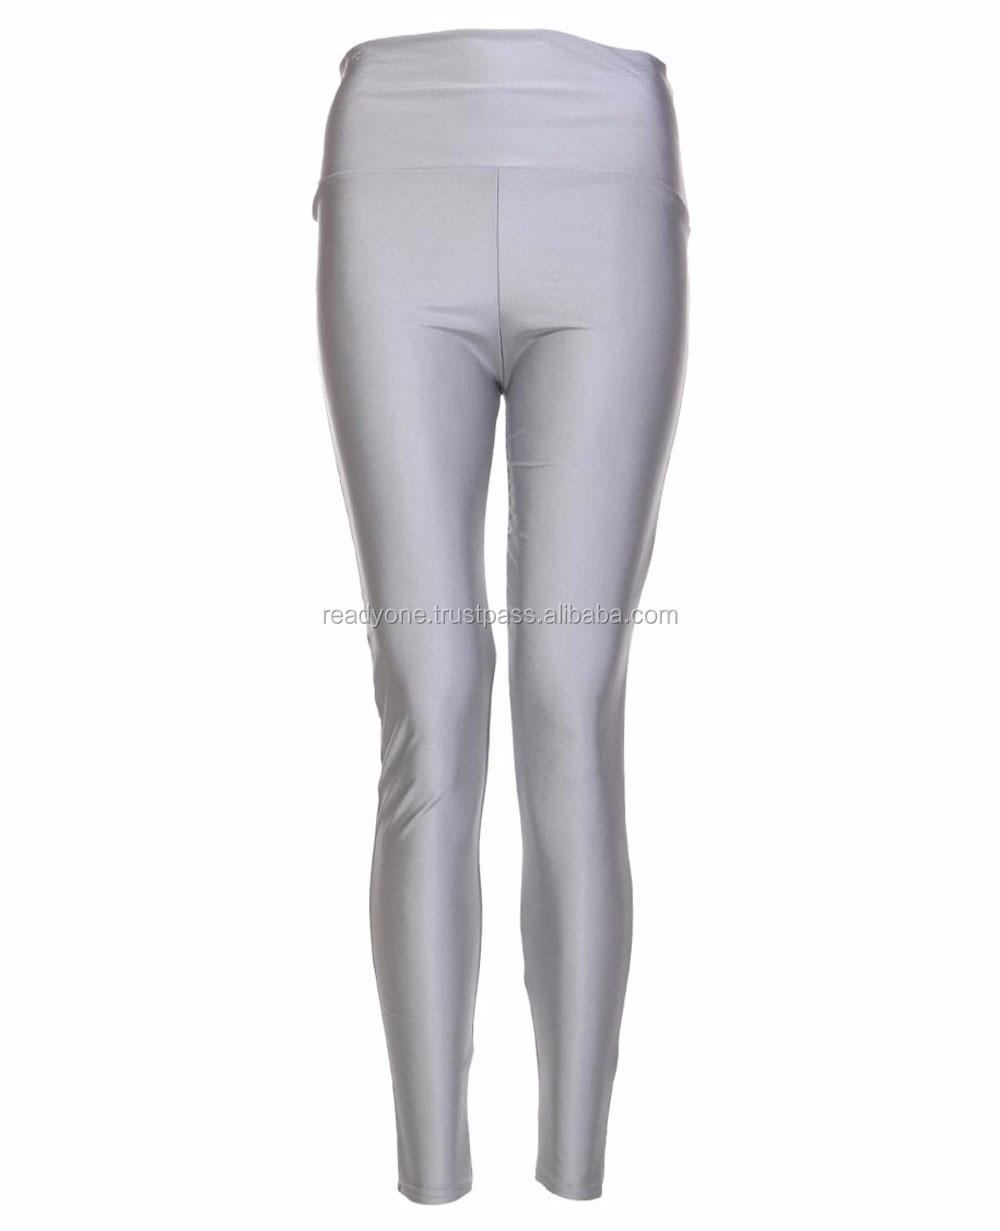 40bfa1811a43c1 Sport Gym Leggings High Quality Fitness Women's Tight Pant - Buy ...